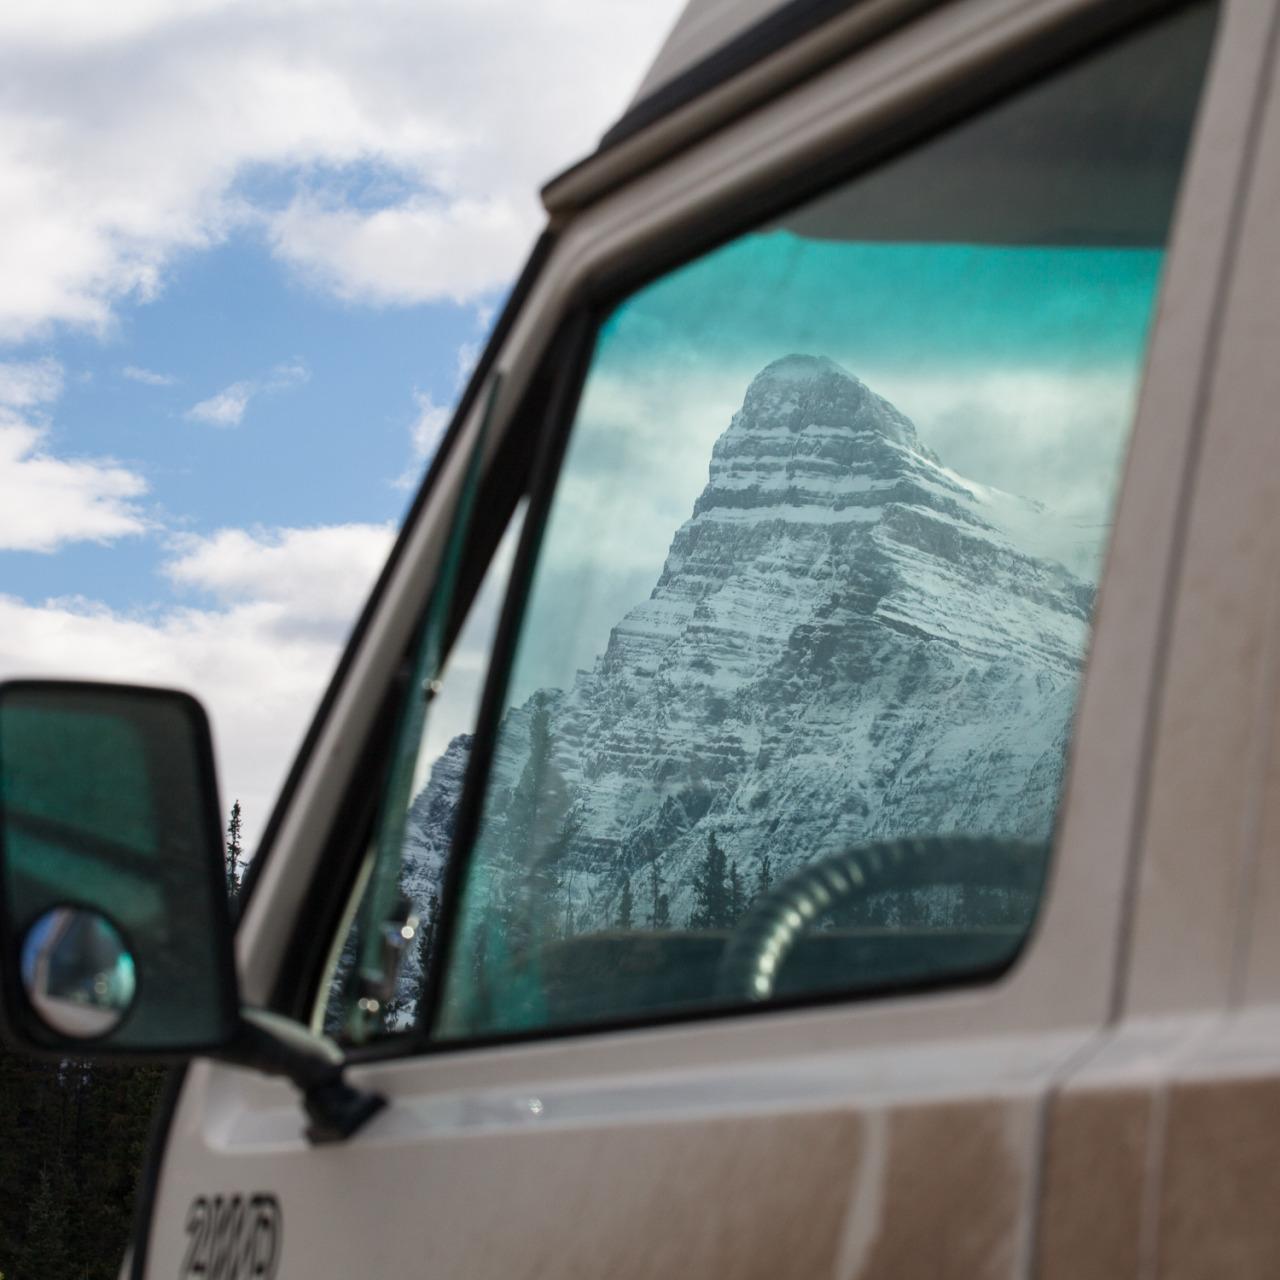 The Canadian Rockies through my van windshield